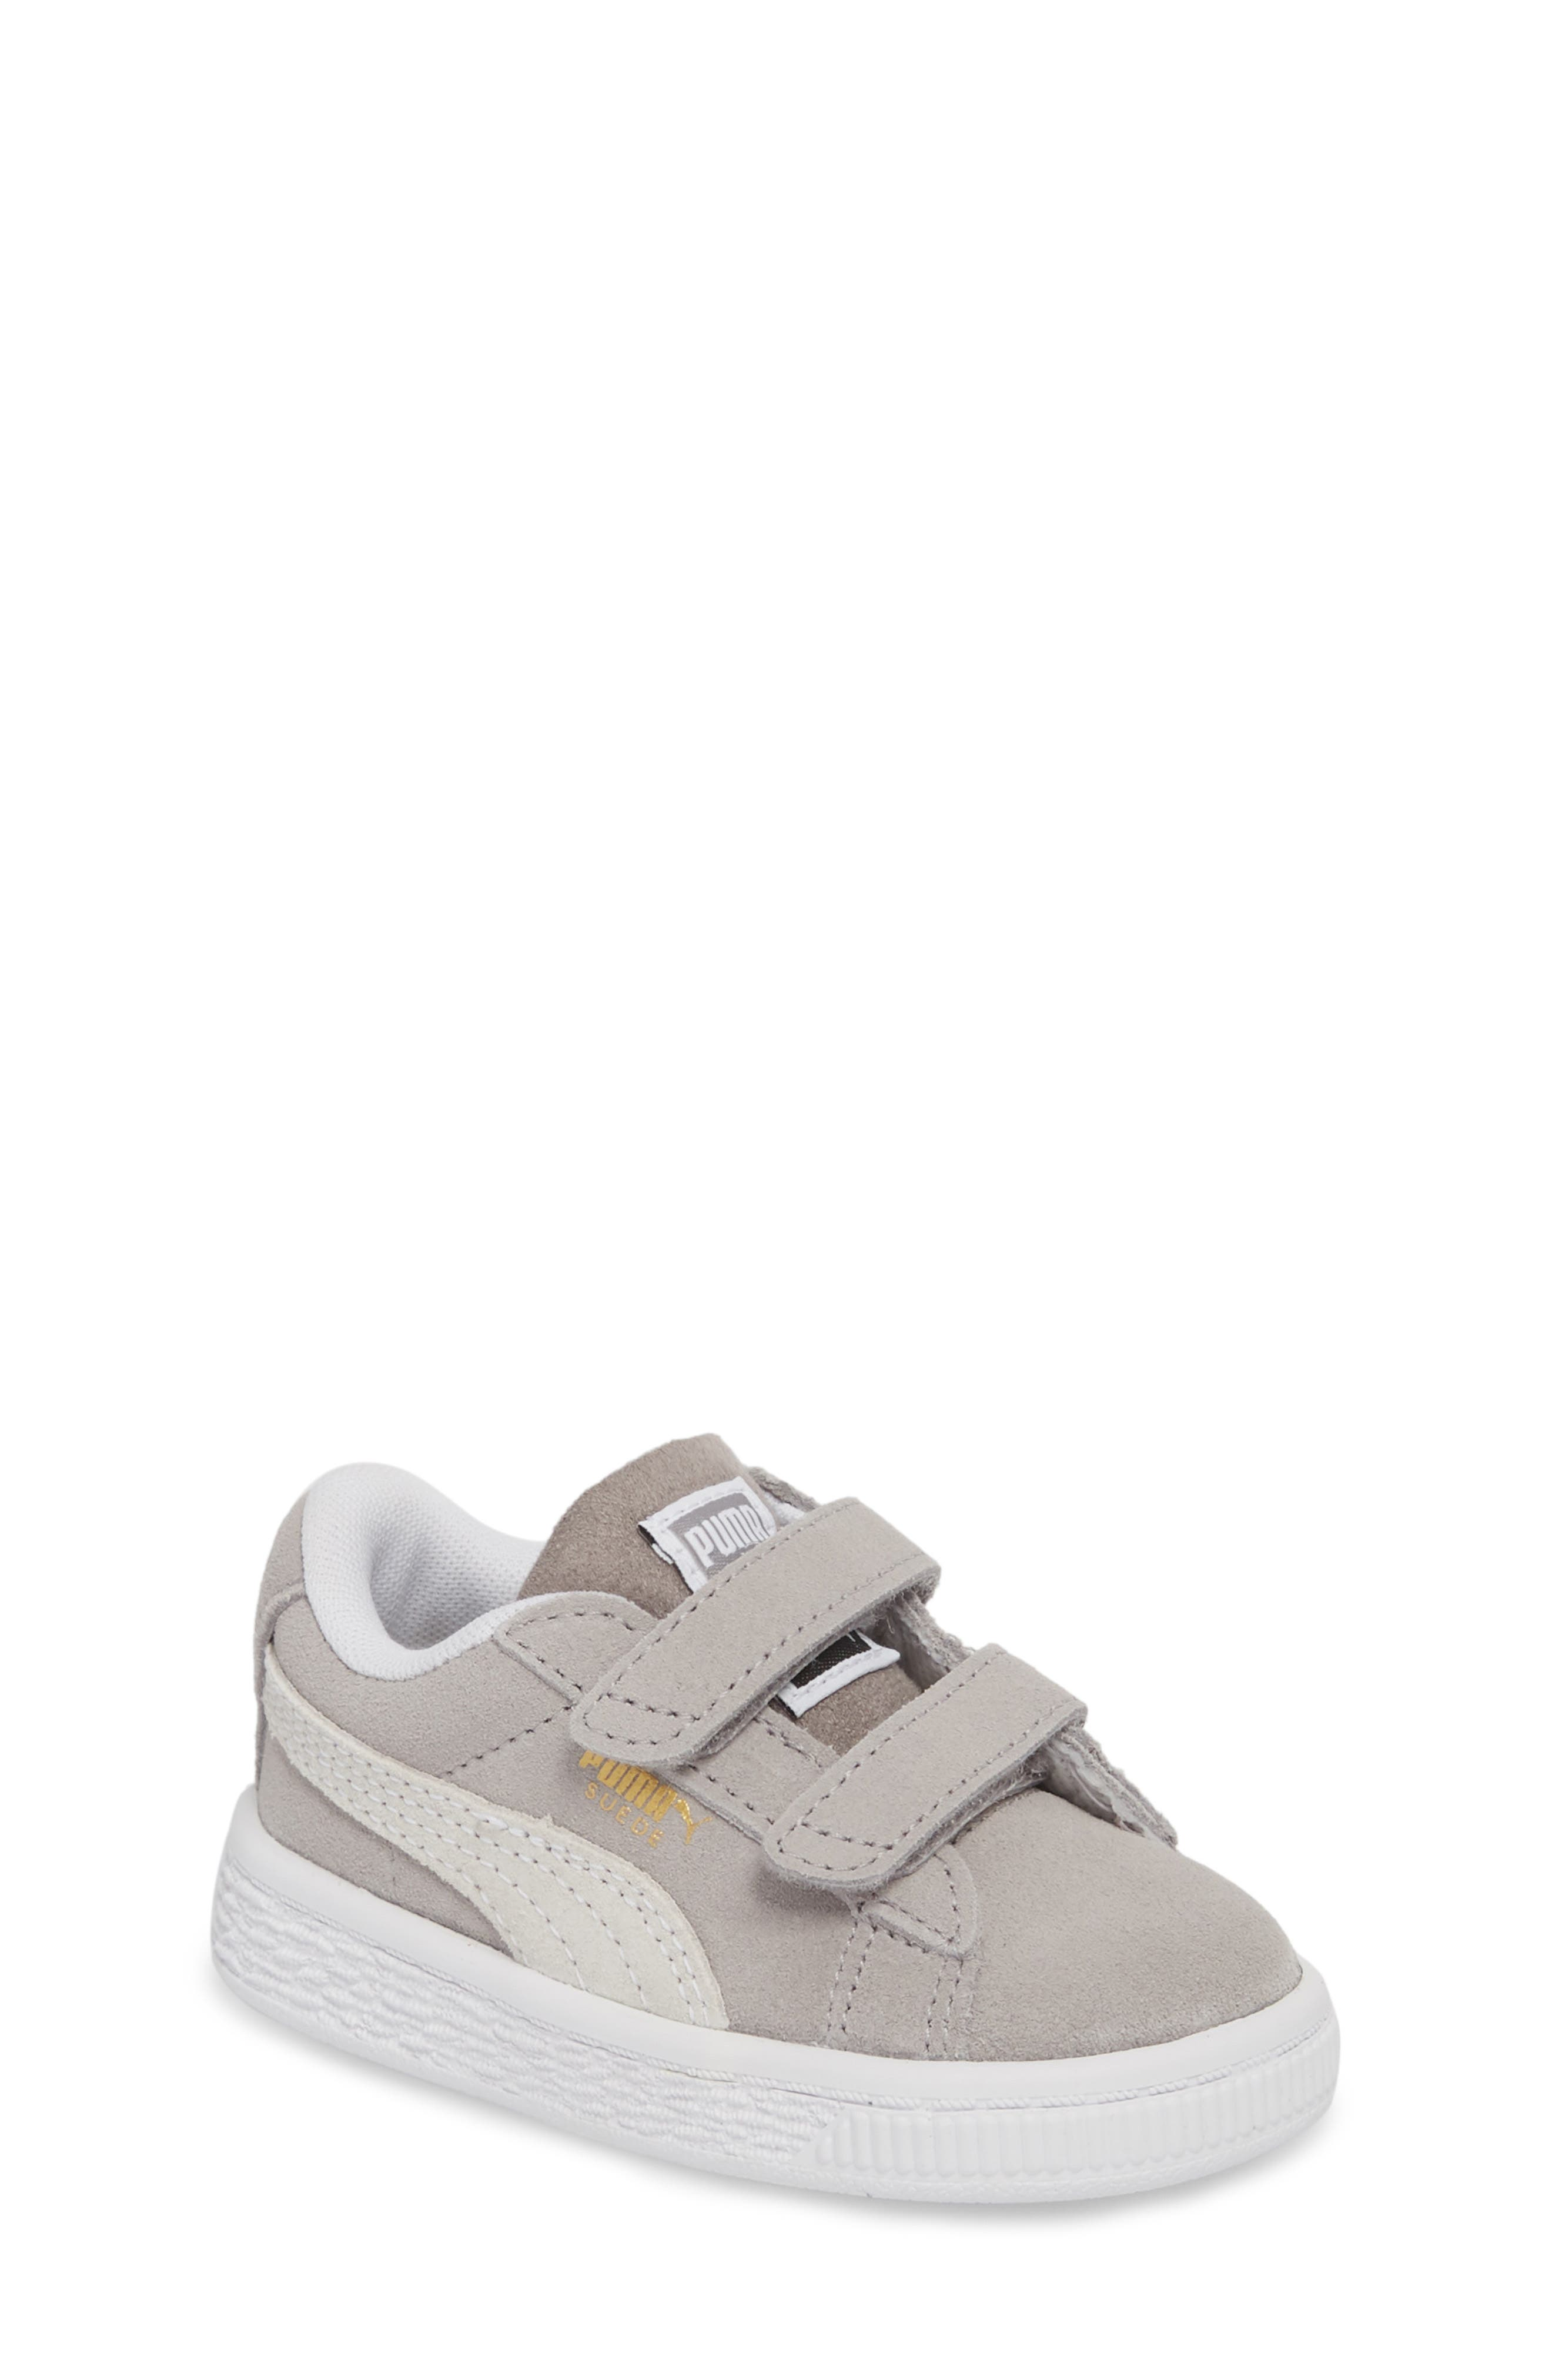 PUMA Suede Classic Sneaker (Baby, Walker, Toddler, Little Kid & Big Kid)